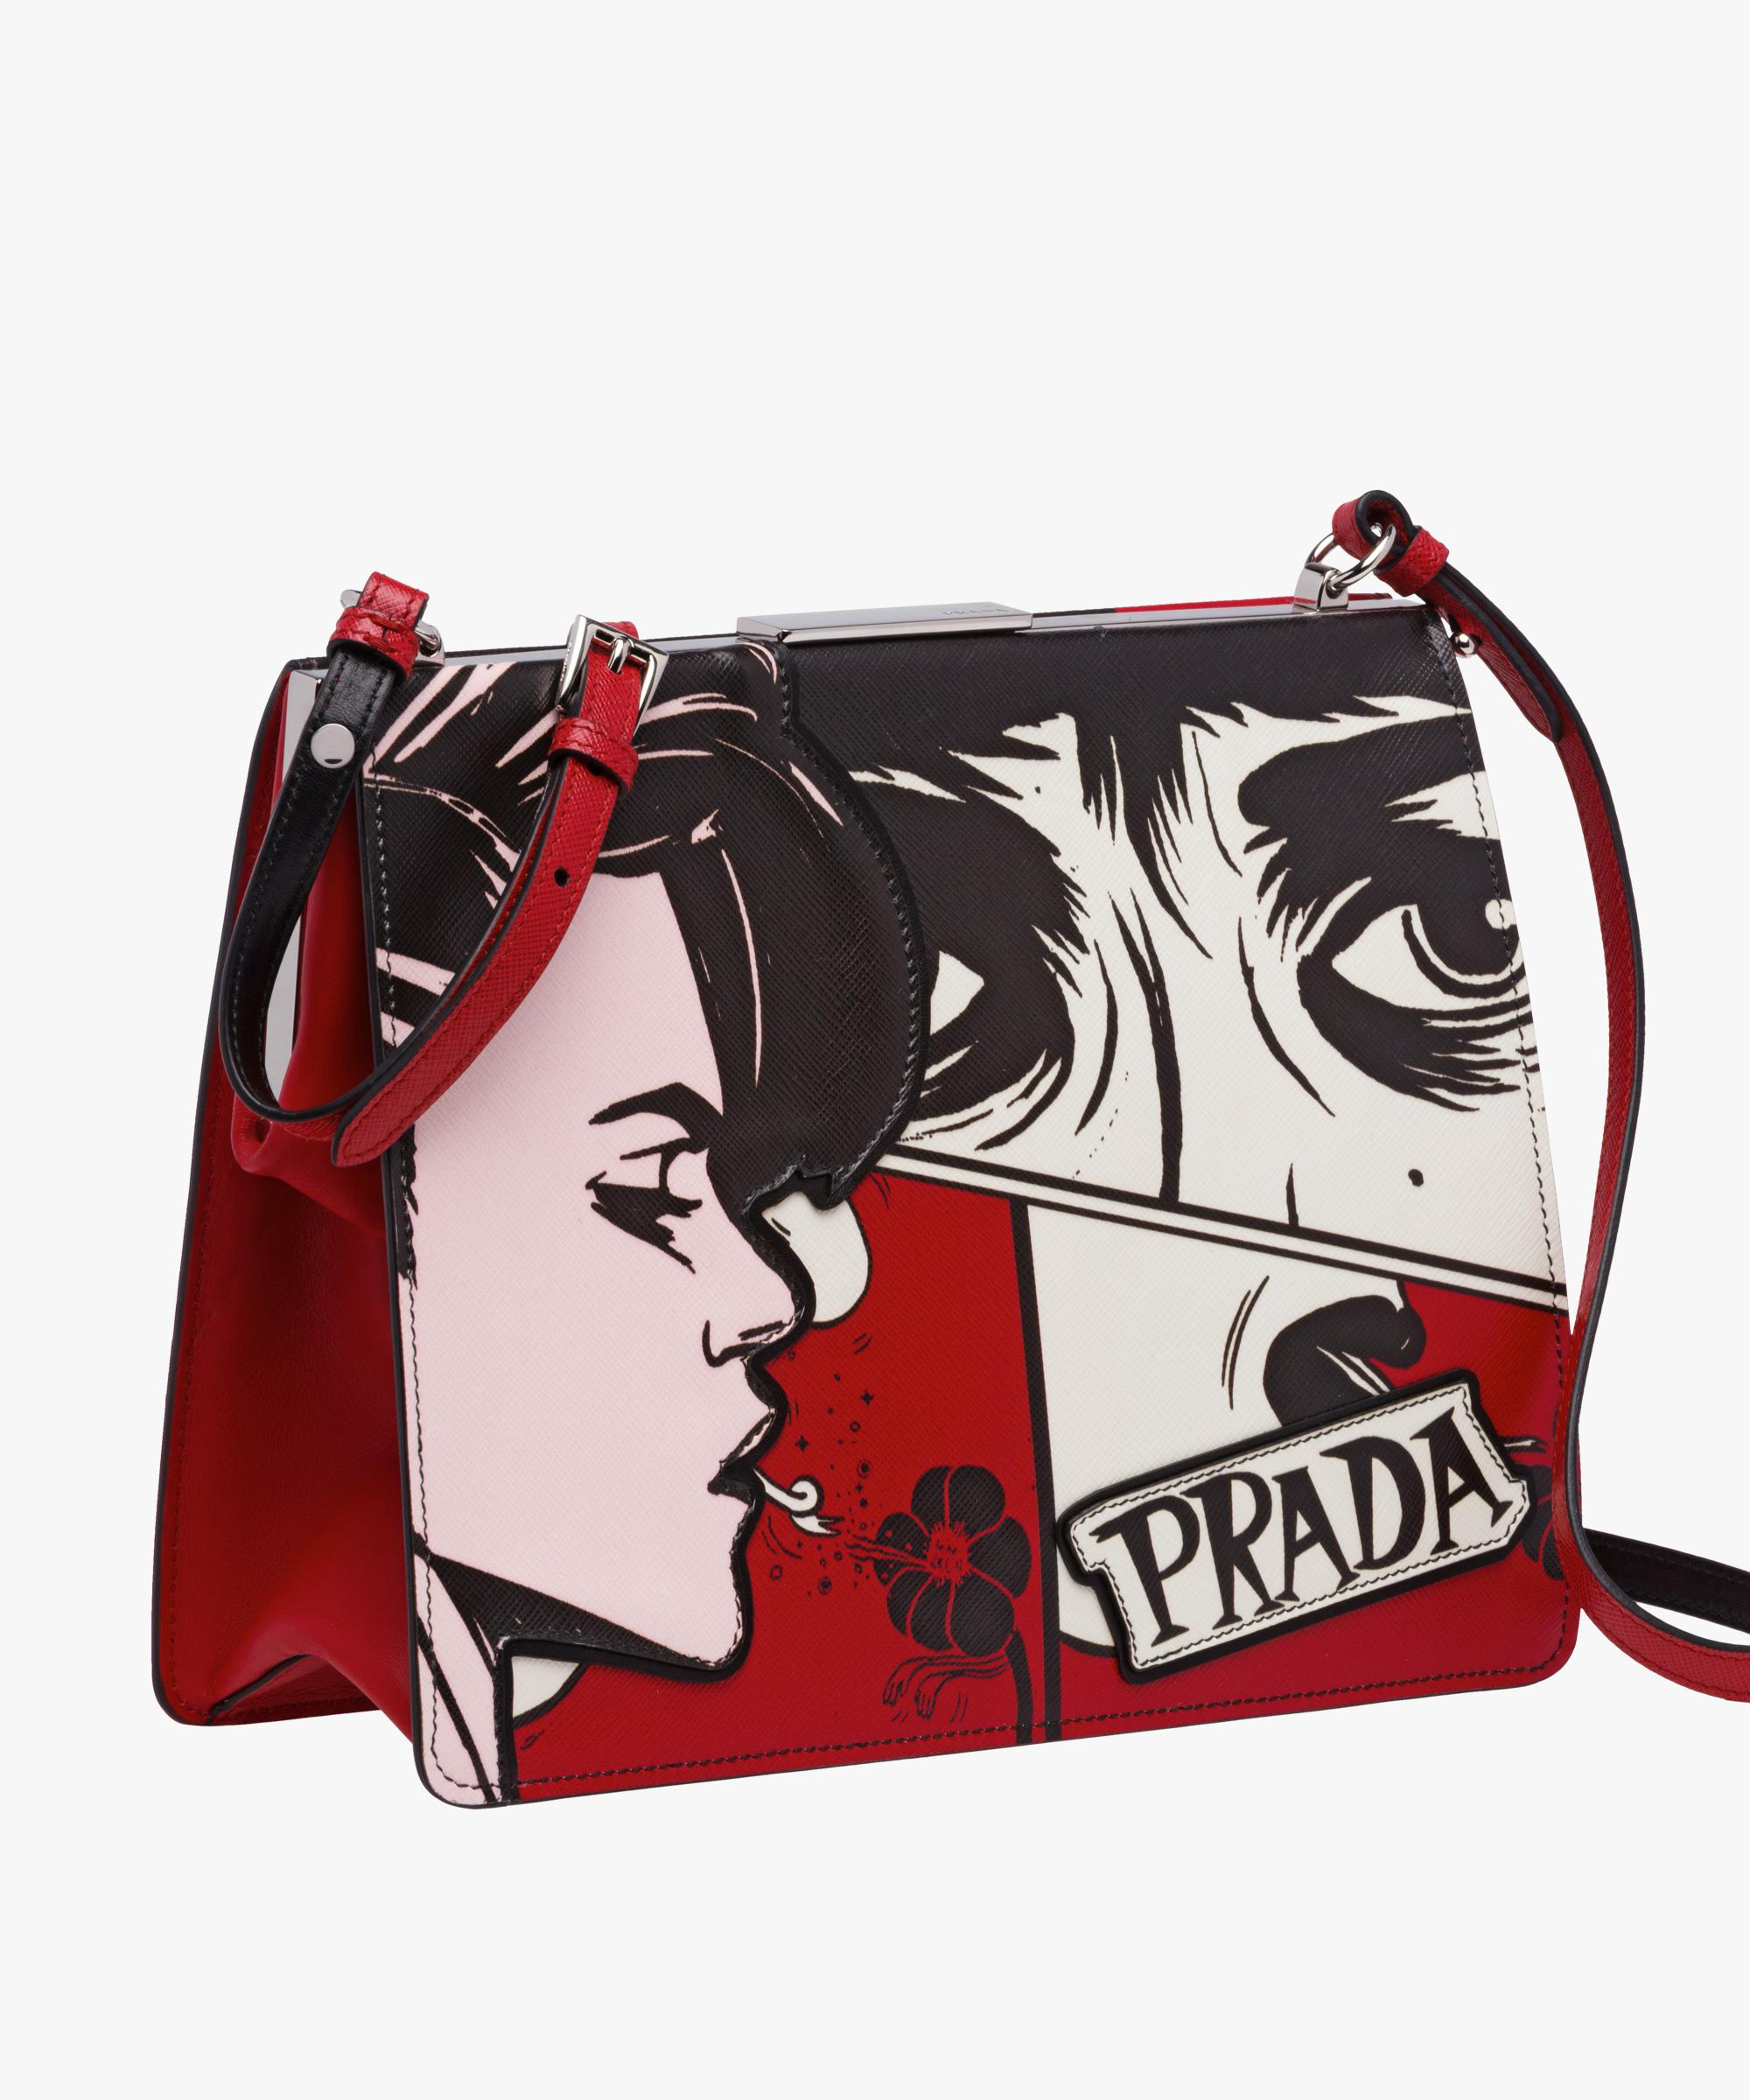 f121313684ce73 ... order lyst prada light frame printed leather bag in red 22459 93ba3